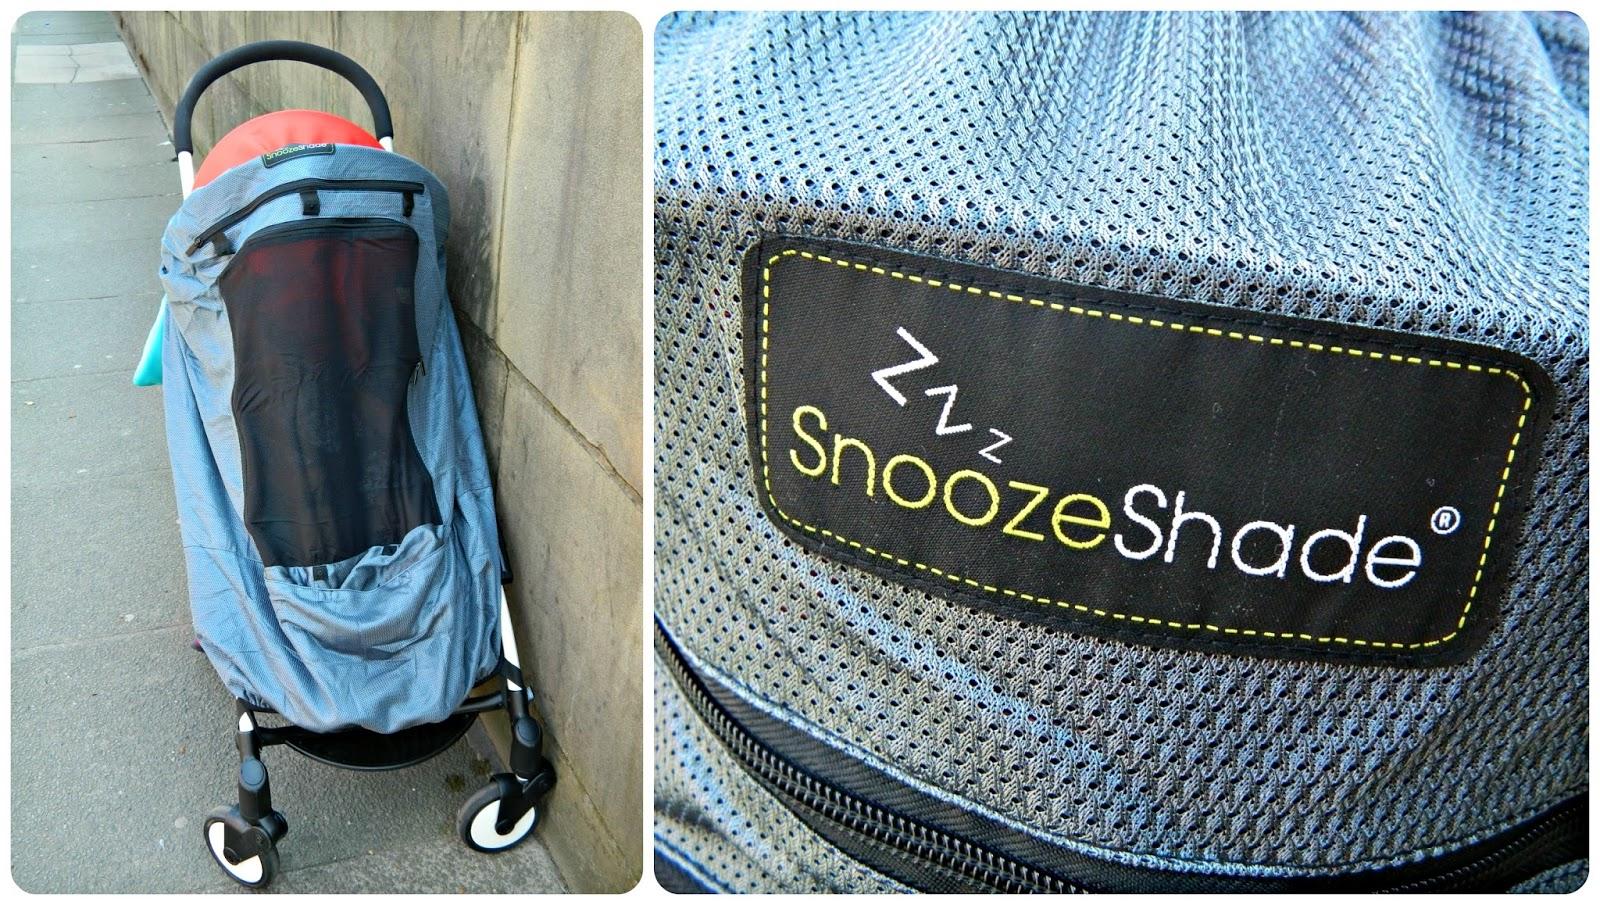 Snoozeshade Plus Deluxe on BabyZen YoYo